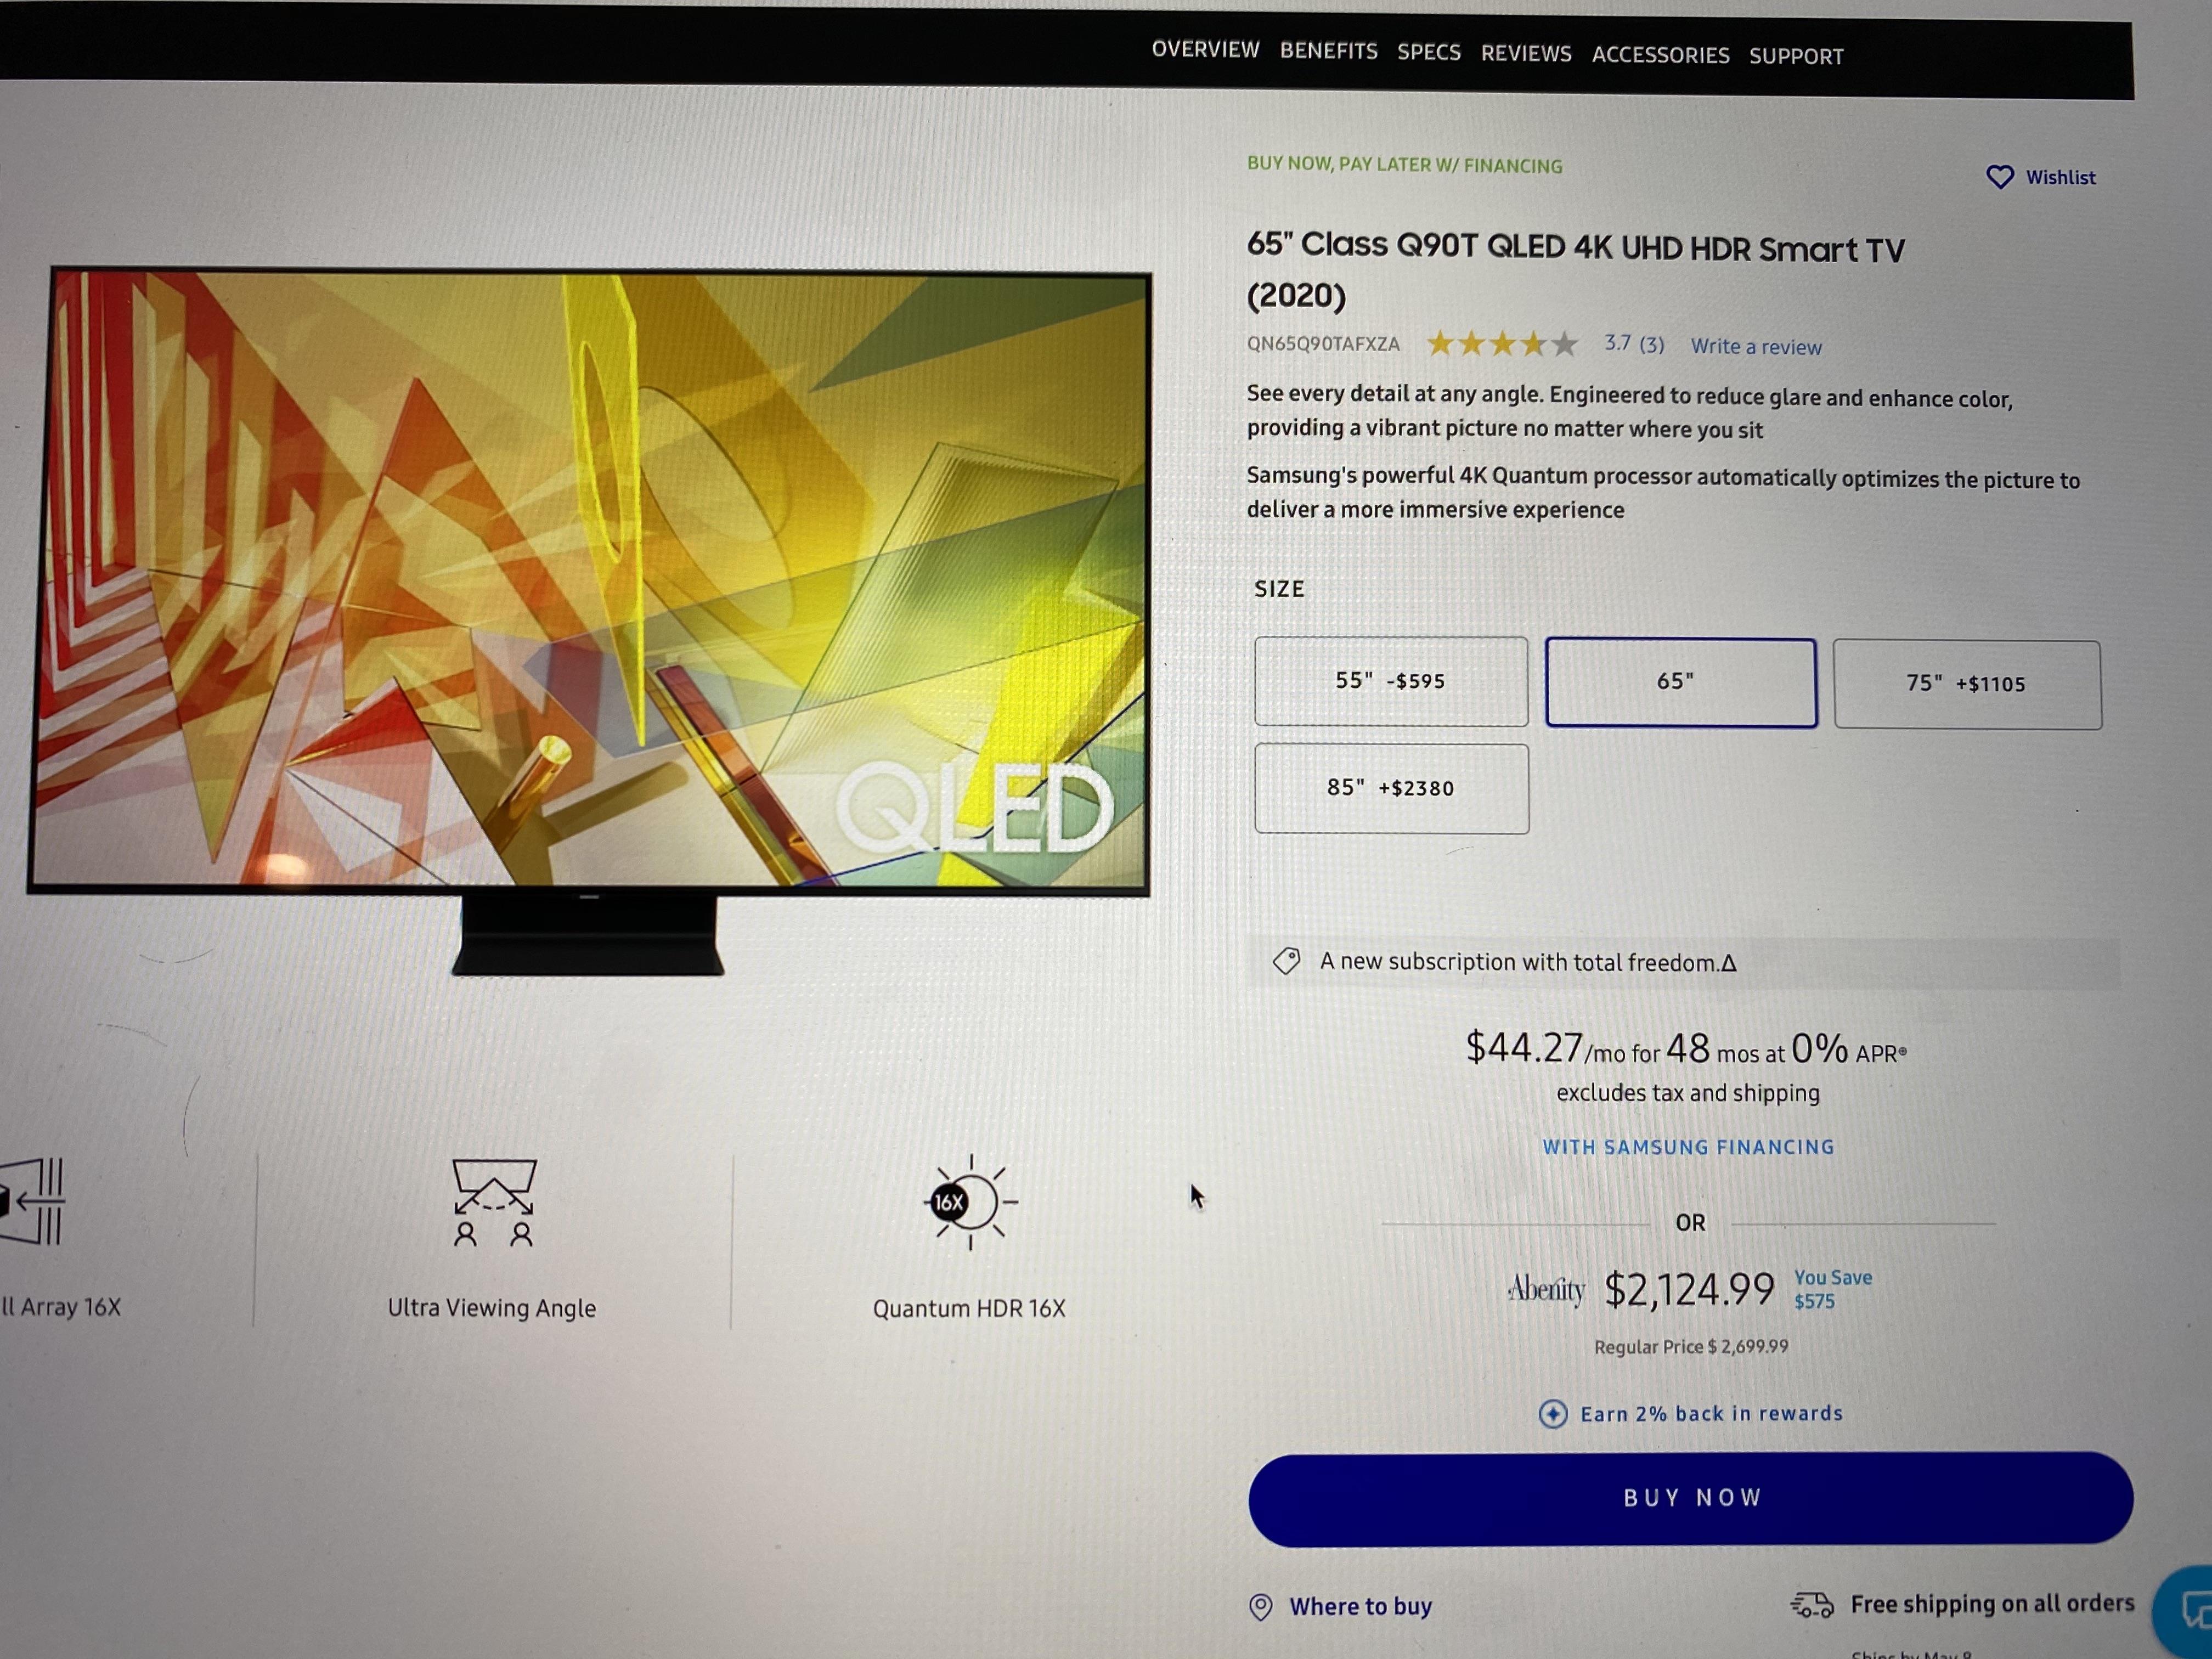 "65"" Class Q90T QLED 4K UHD HDR Smart TV (2020) - $2,124.99 @ Samsung w/ Abenity discount"